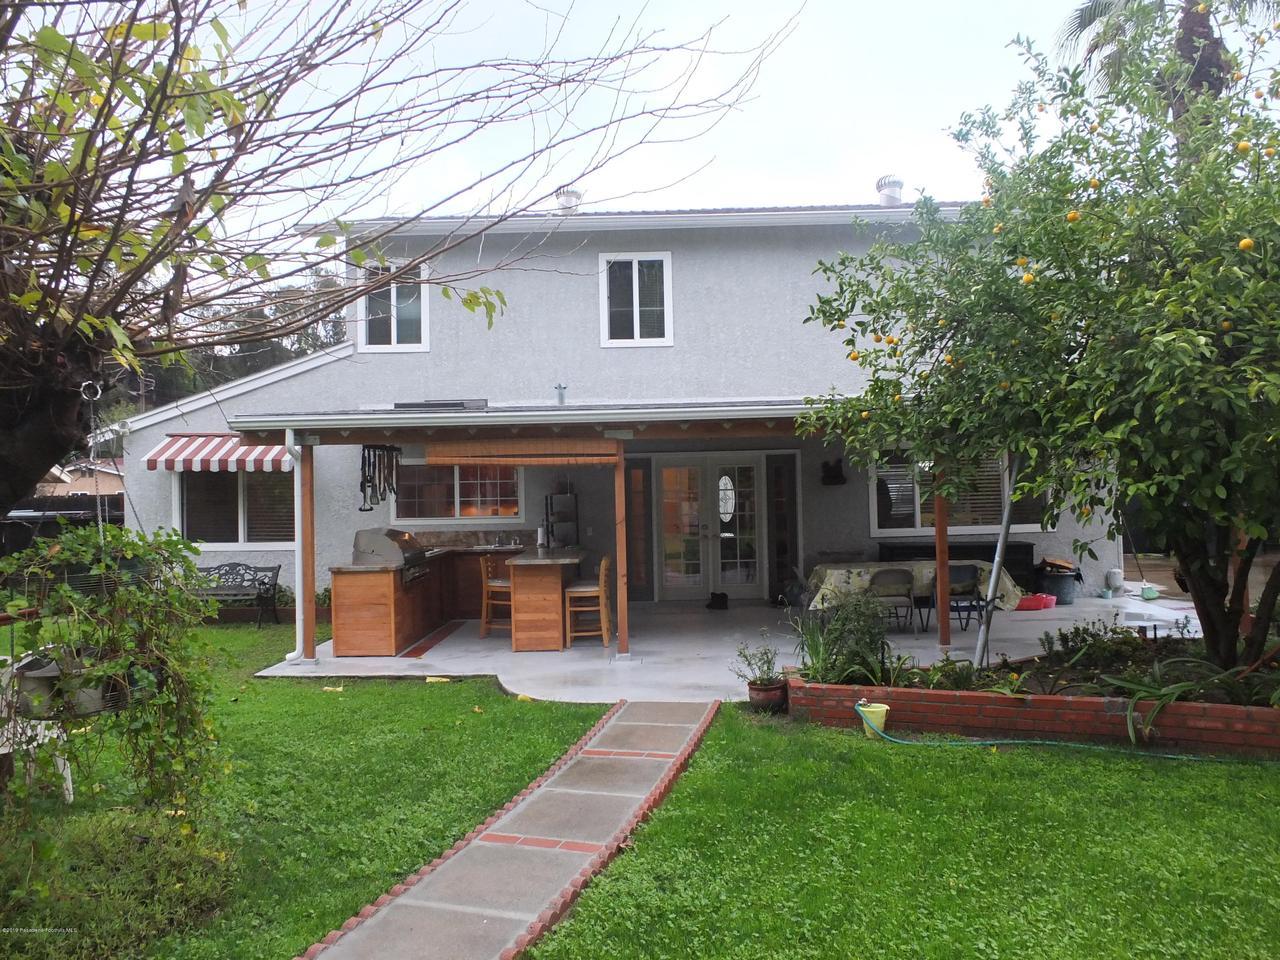 1729 OAKGREEN, West Covina, CA 91792 - backyard for entertaining